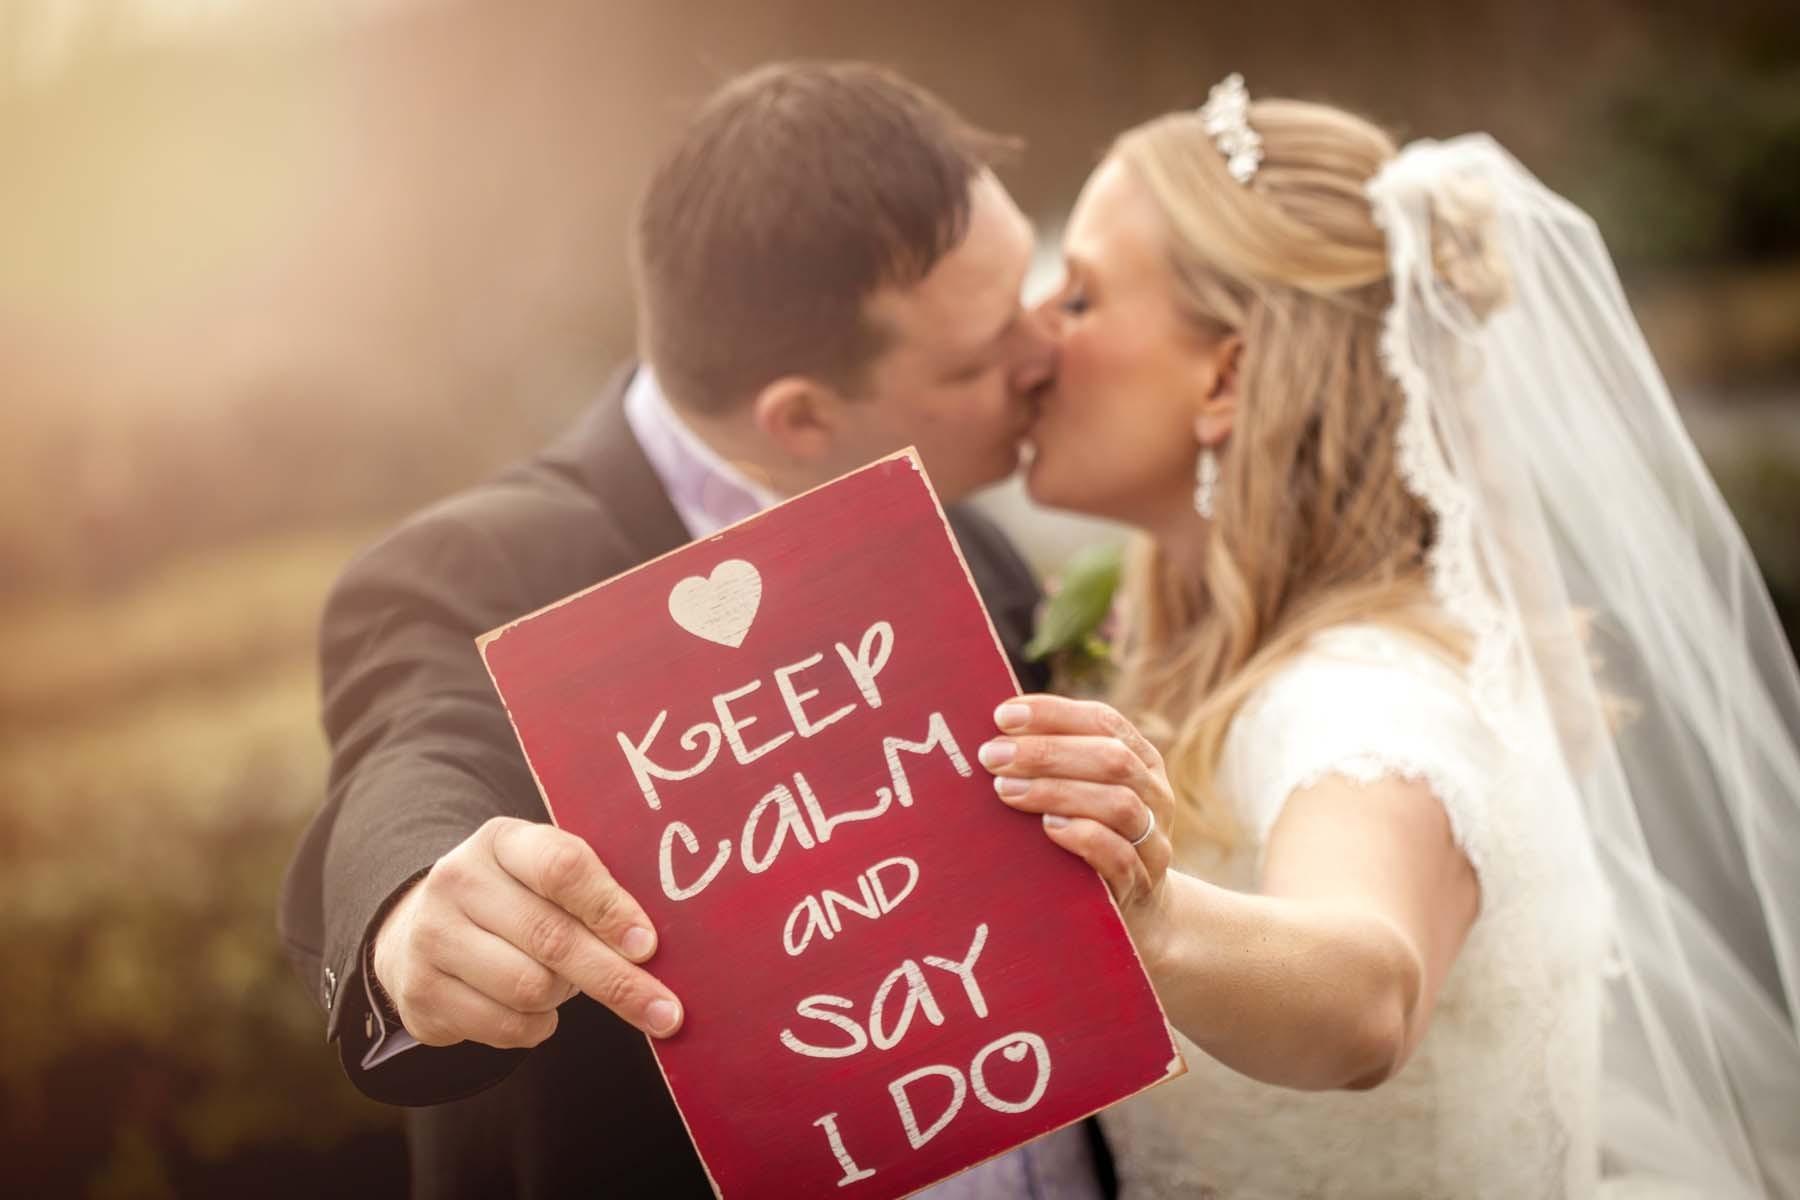 Sussex & Surrey Wedding Photographer - Bride & Groom (8)